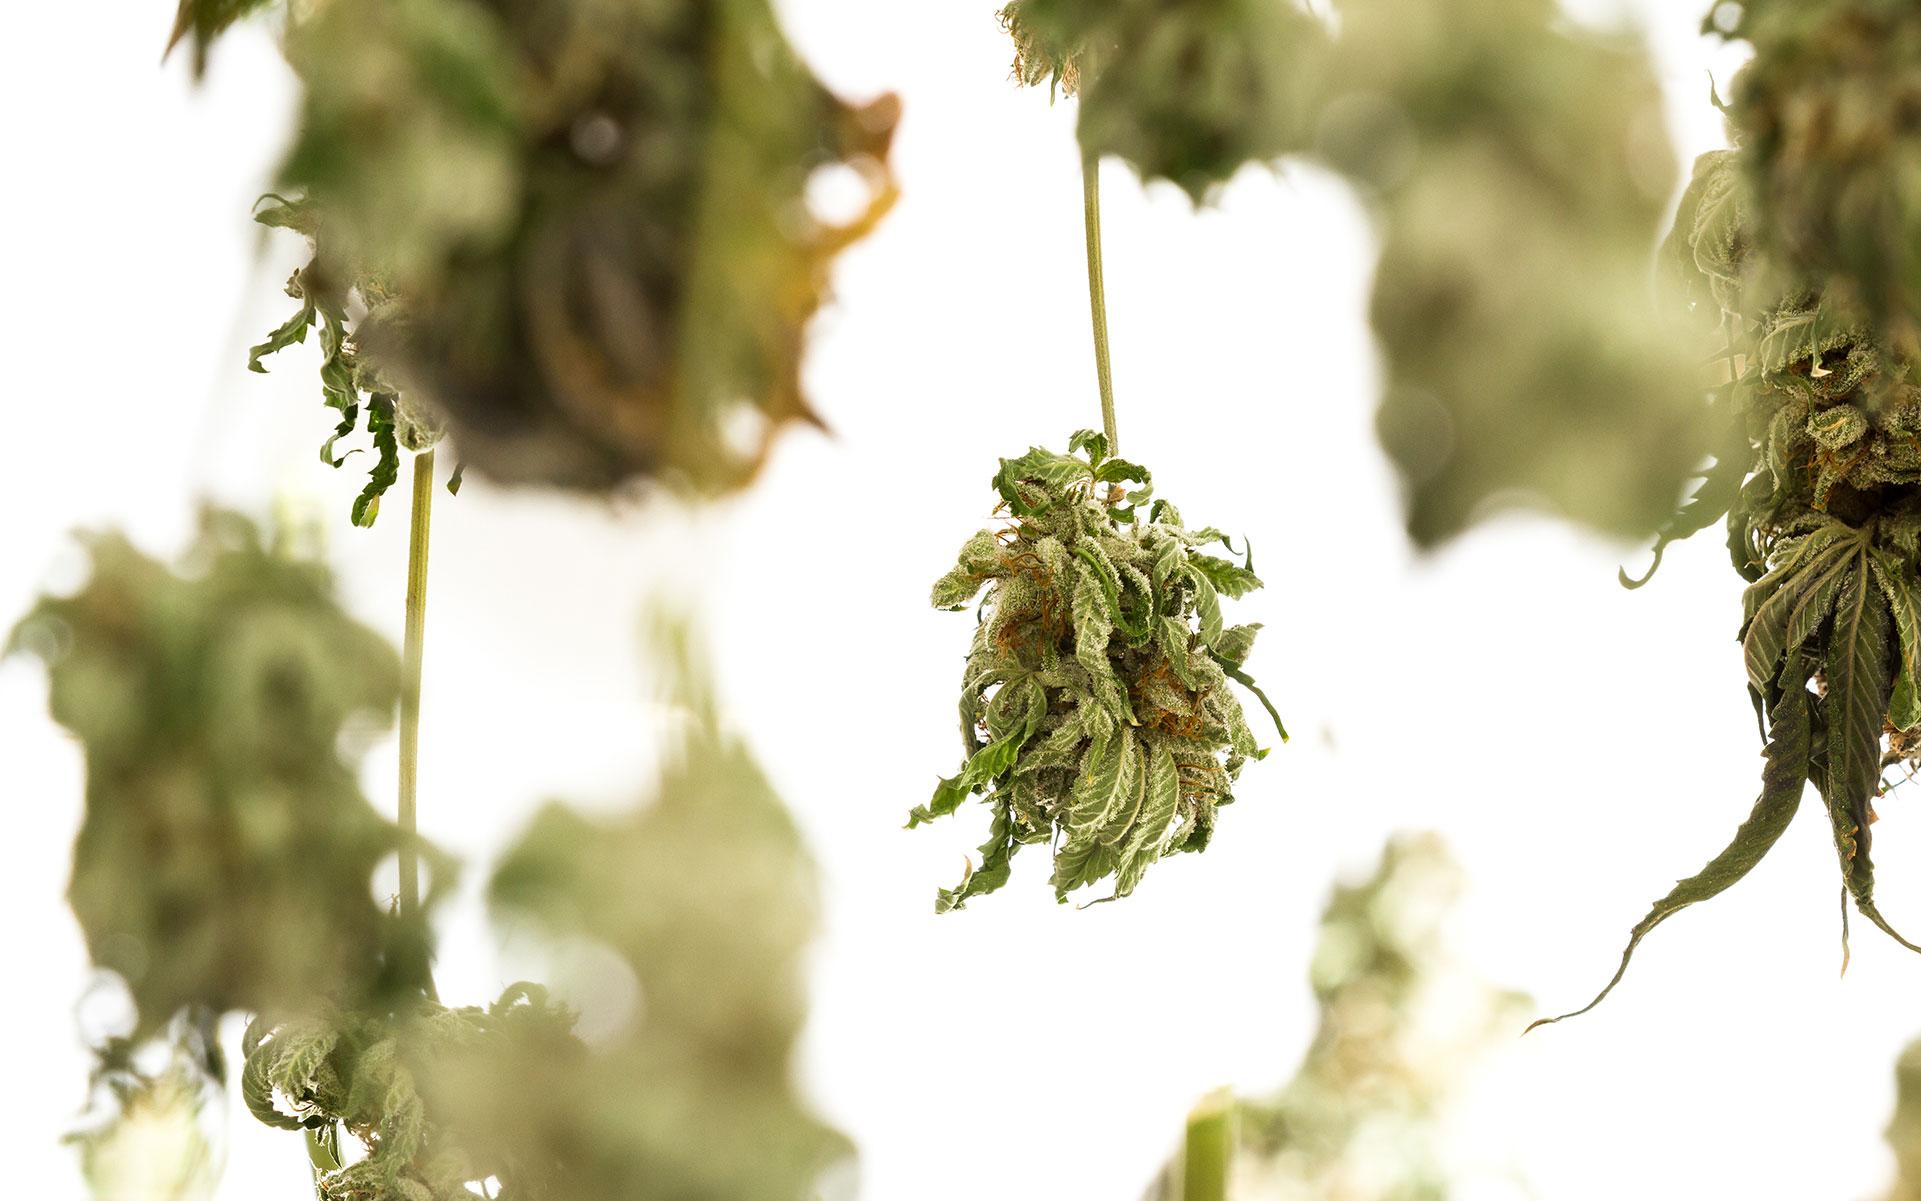 curing and drying marijuana, growing cannabis